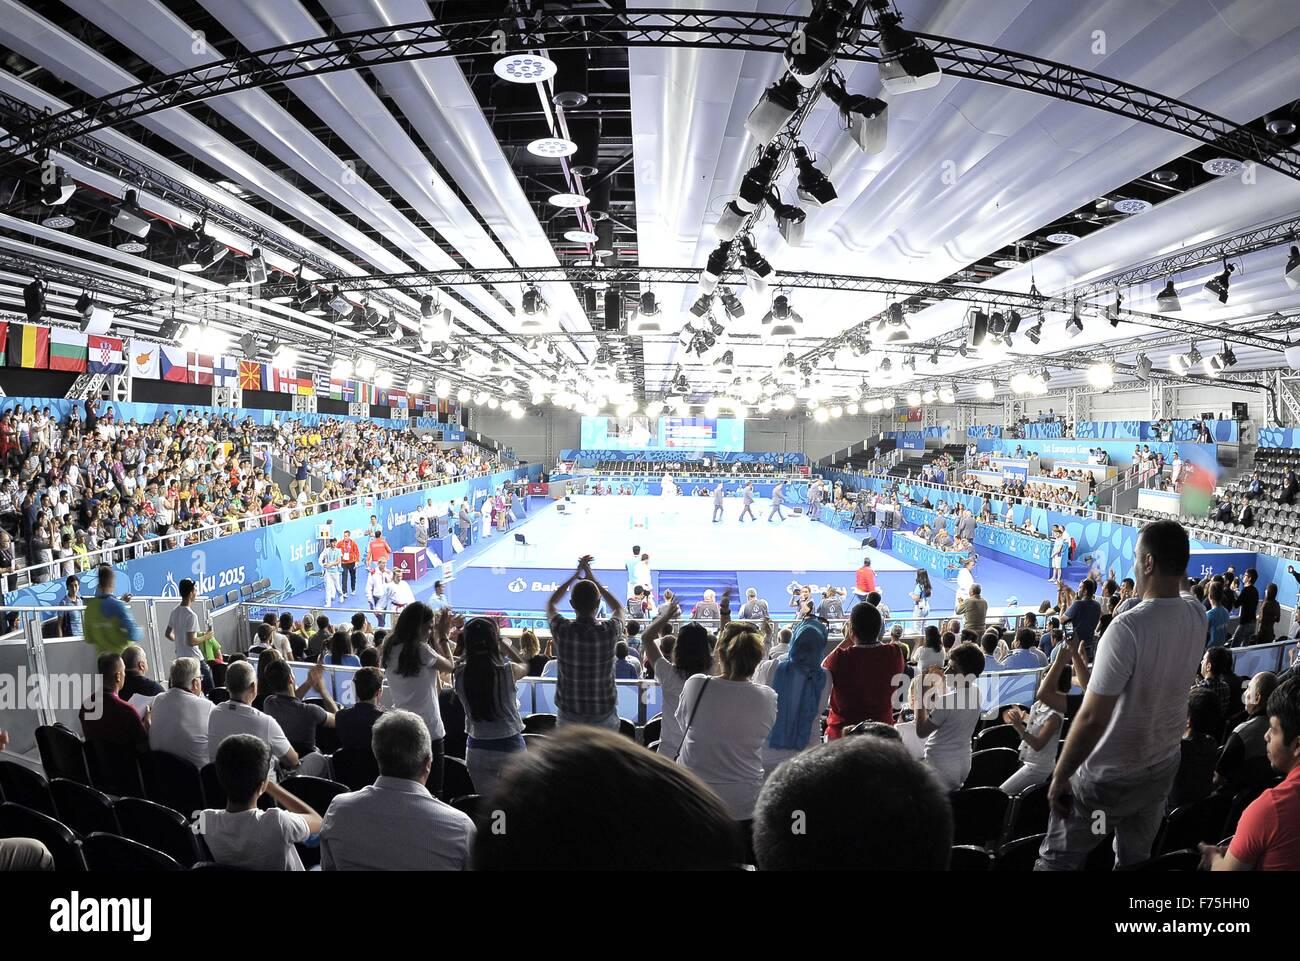 GV. Le karaté. Salle en cristal 3. Bakou. L'Azerbaïdjan. Baku2015. 1er jeux européens. 13/06/2015. Photo Stock